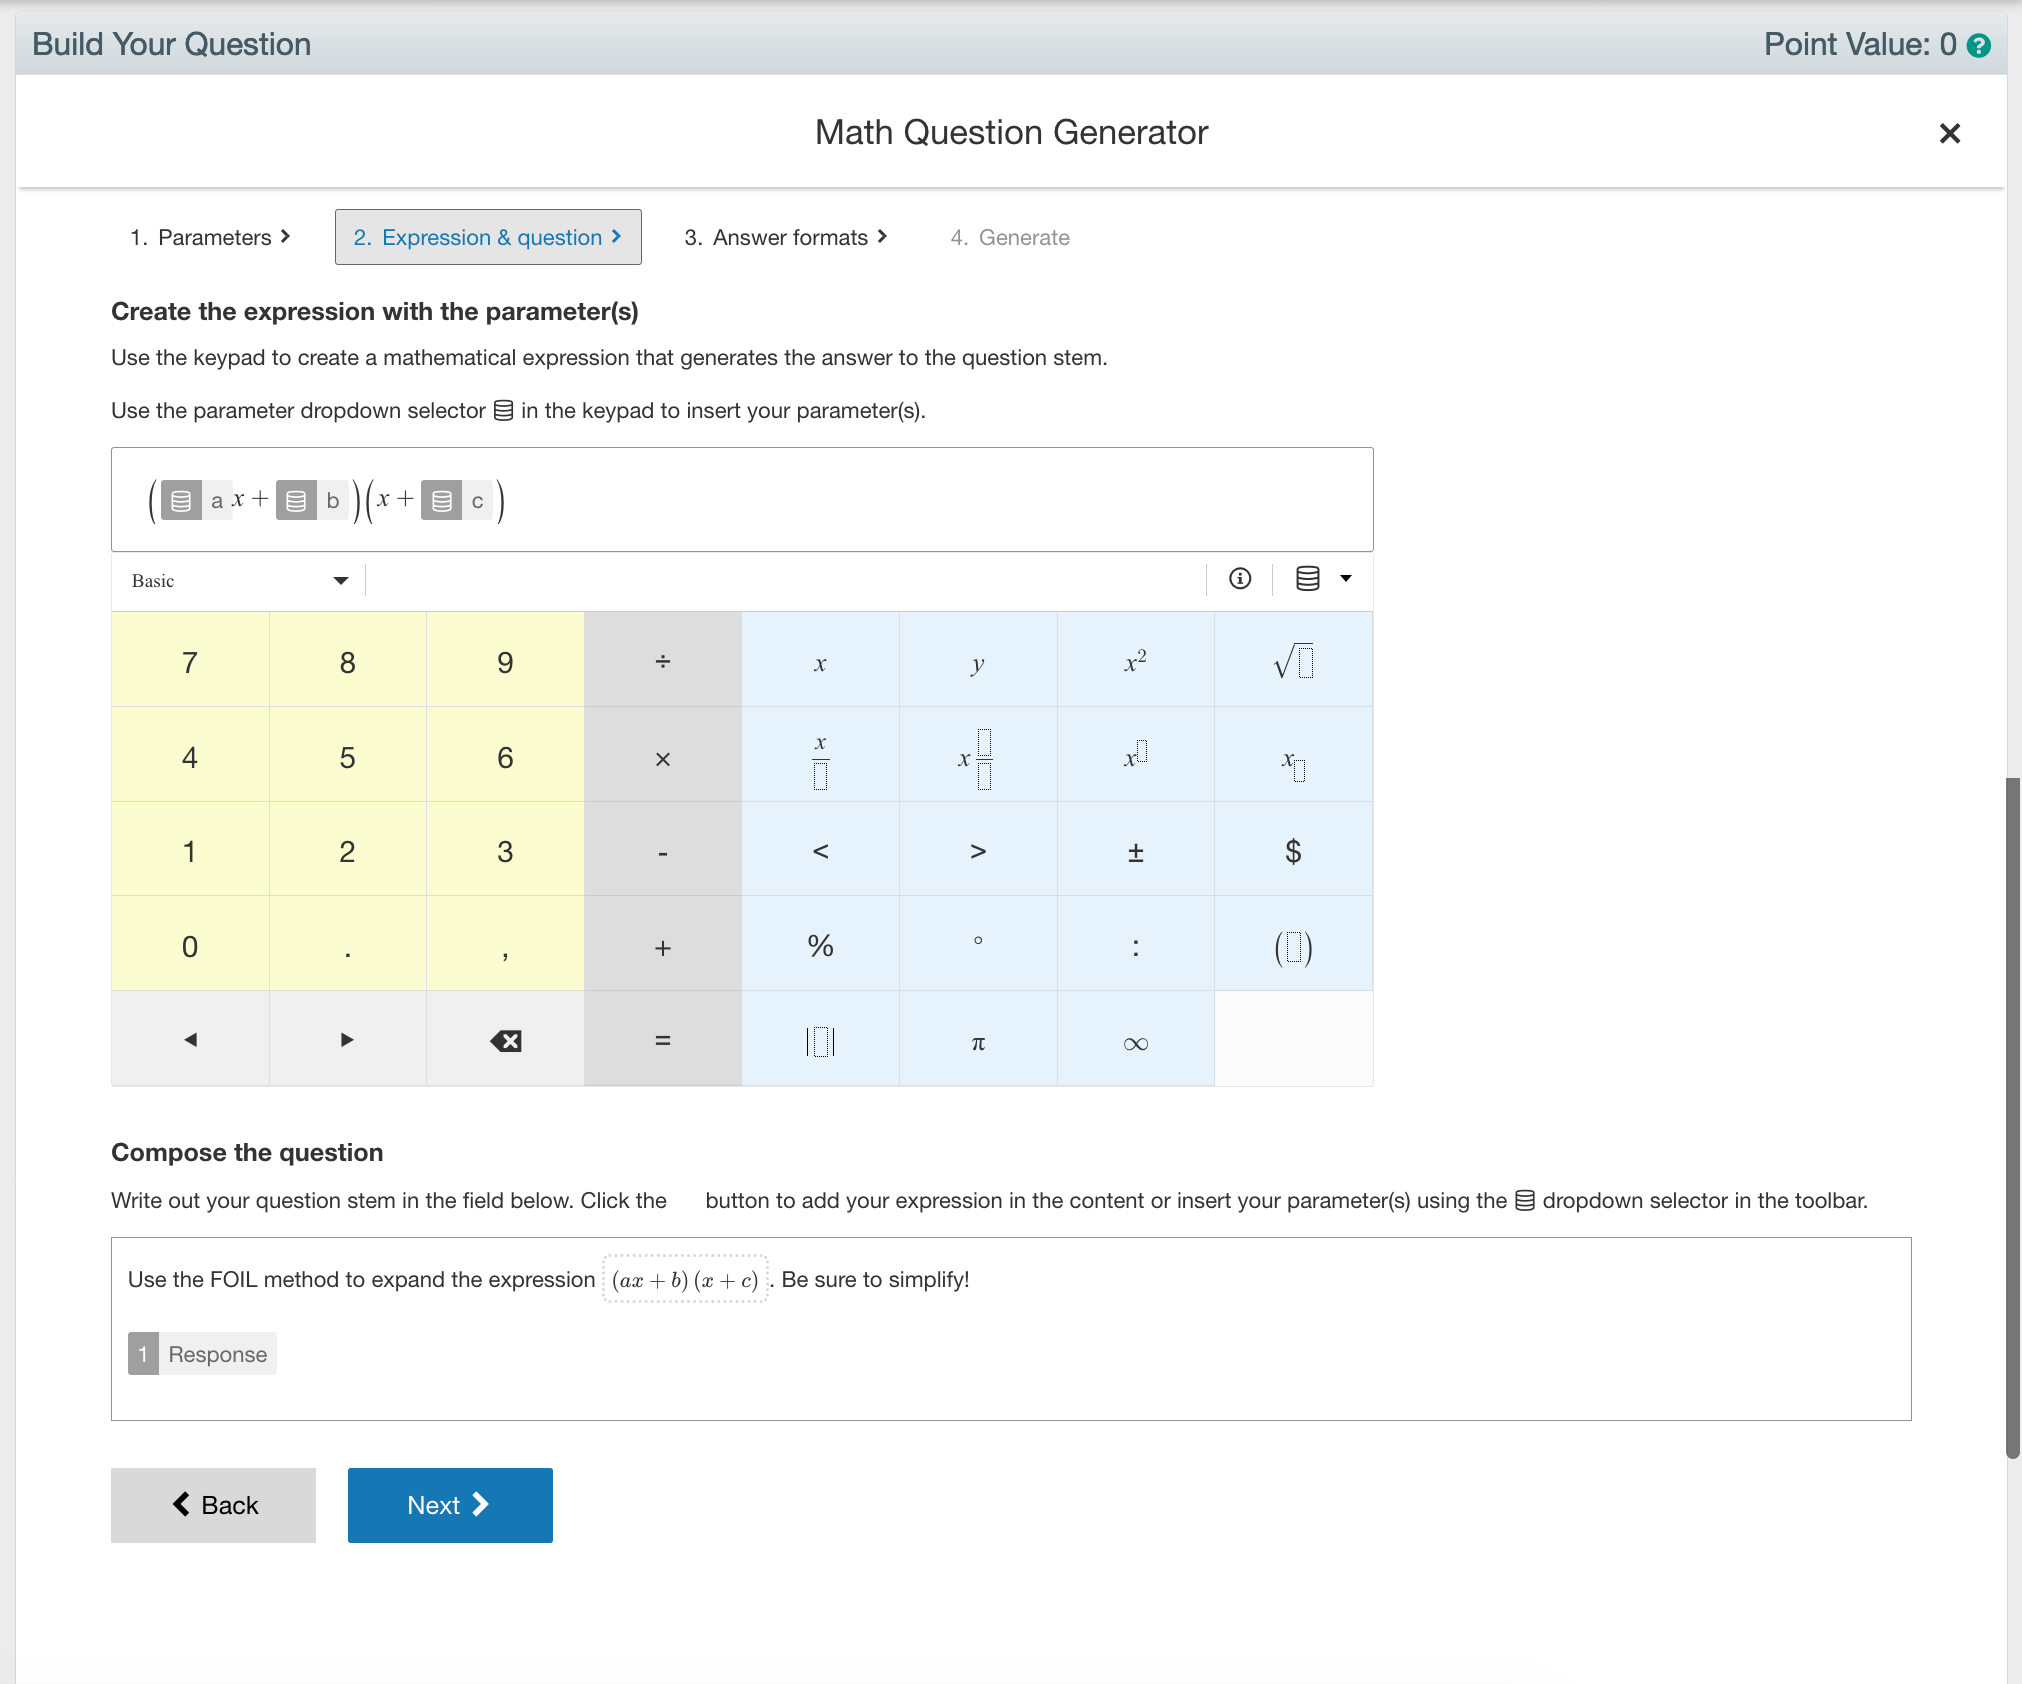 Math Question Generator Step 2